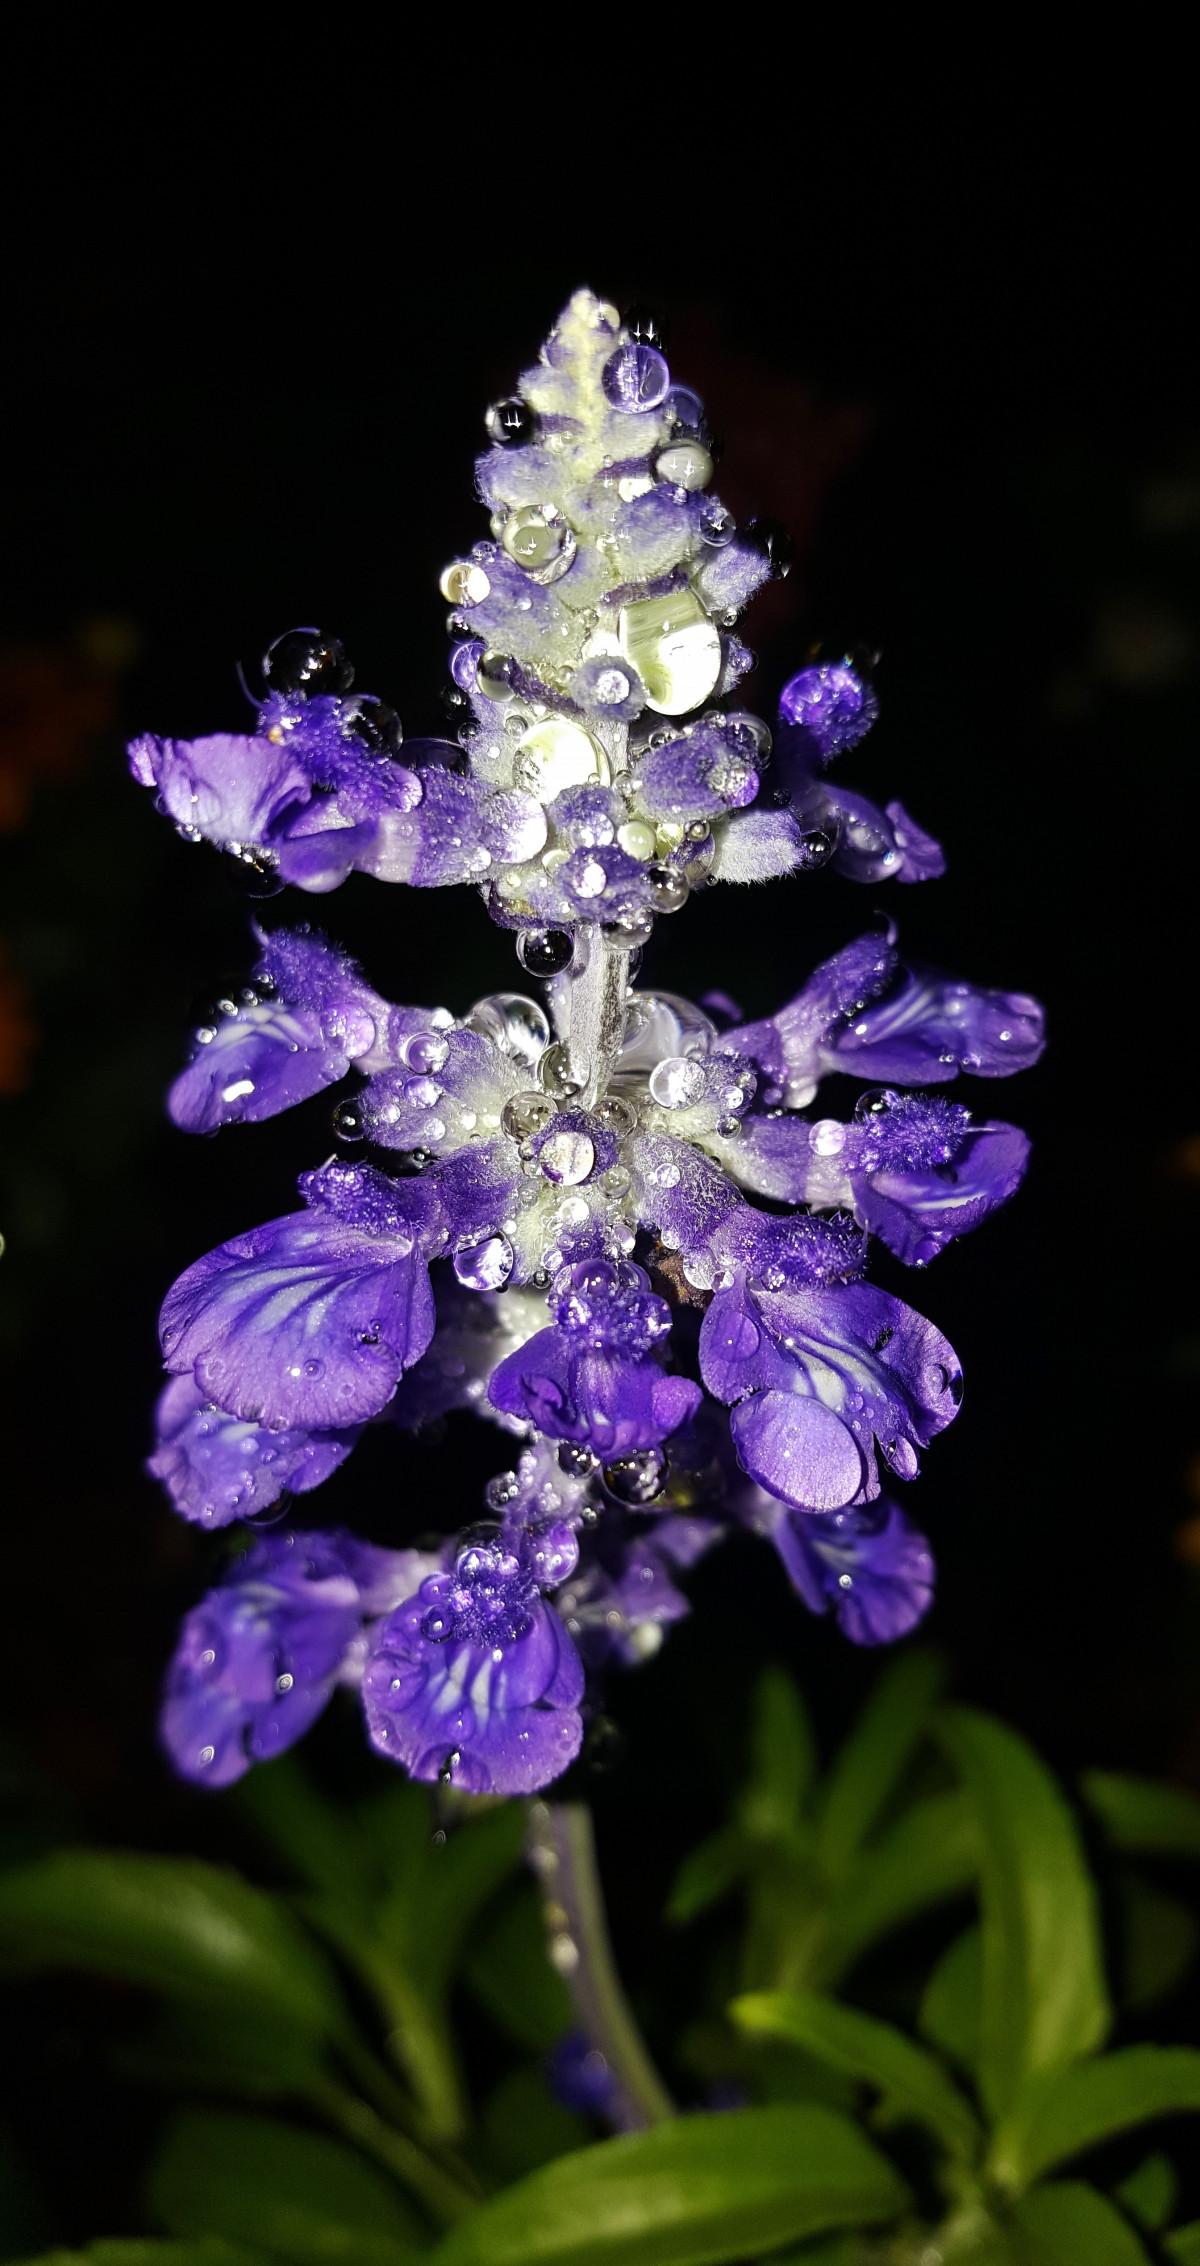 Free Images : blossom, dew, night, flower, petal, bloom ...